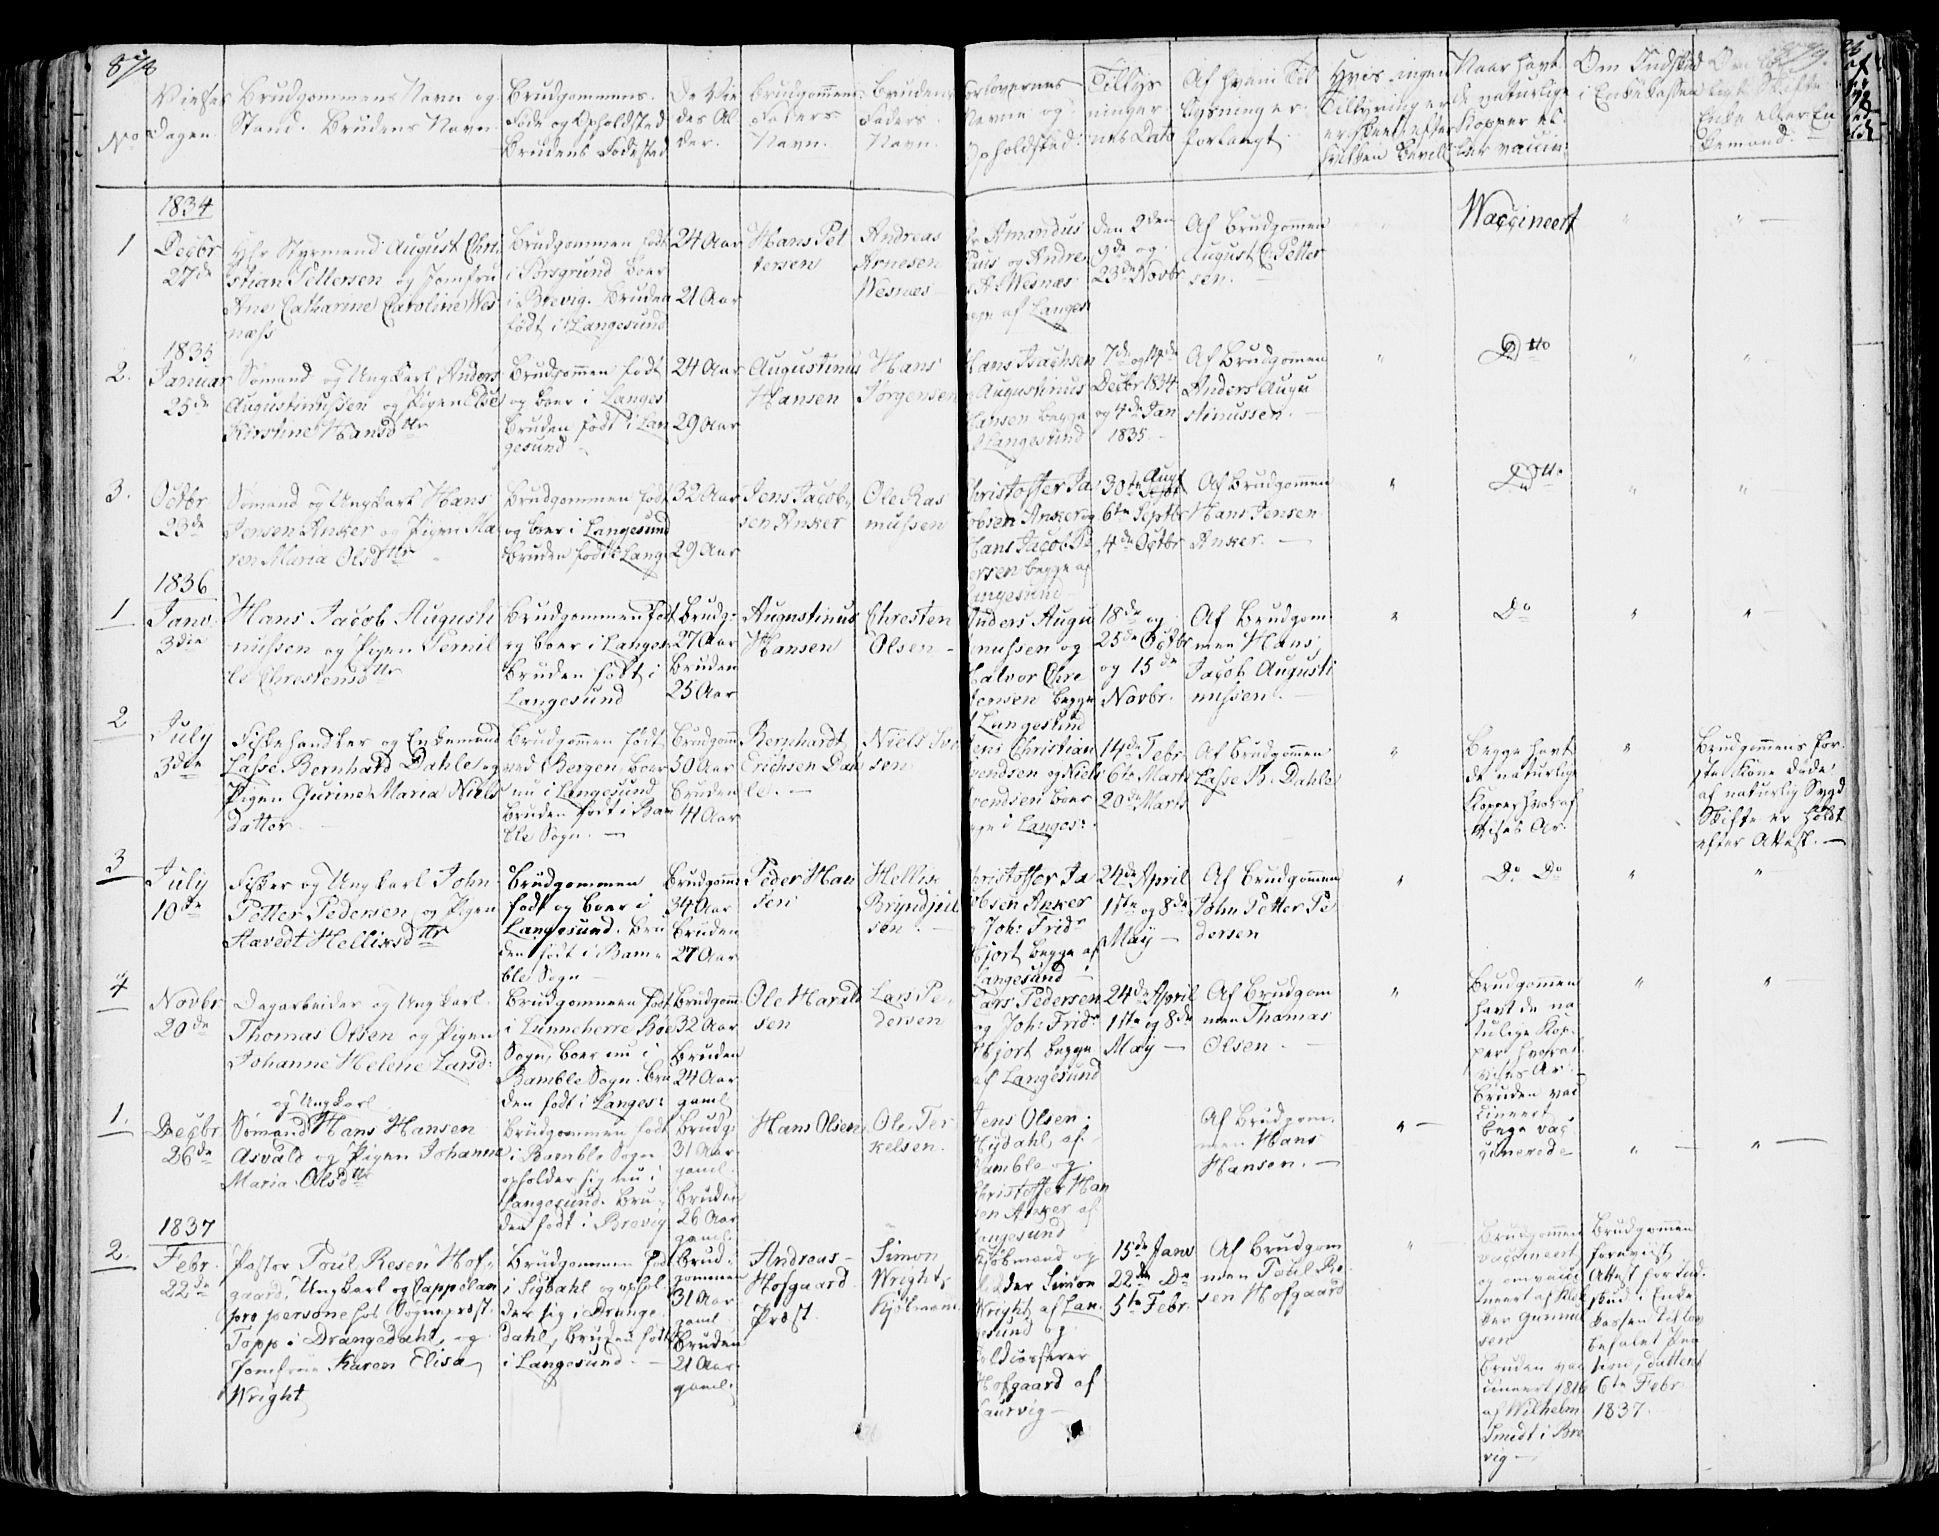 SAKO, Bamble kirkebøker, F/Fa/L0004: Ministerialbok nr. I 4, 1834-1853, s. 878-879